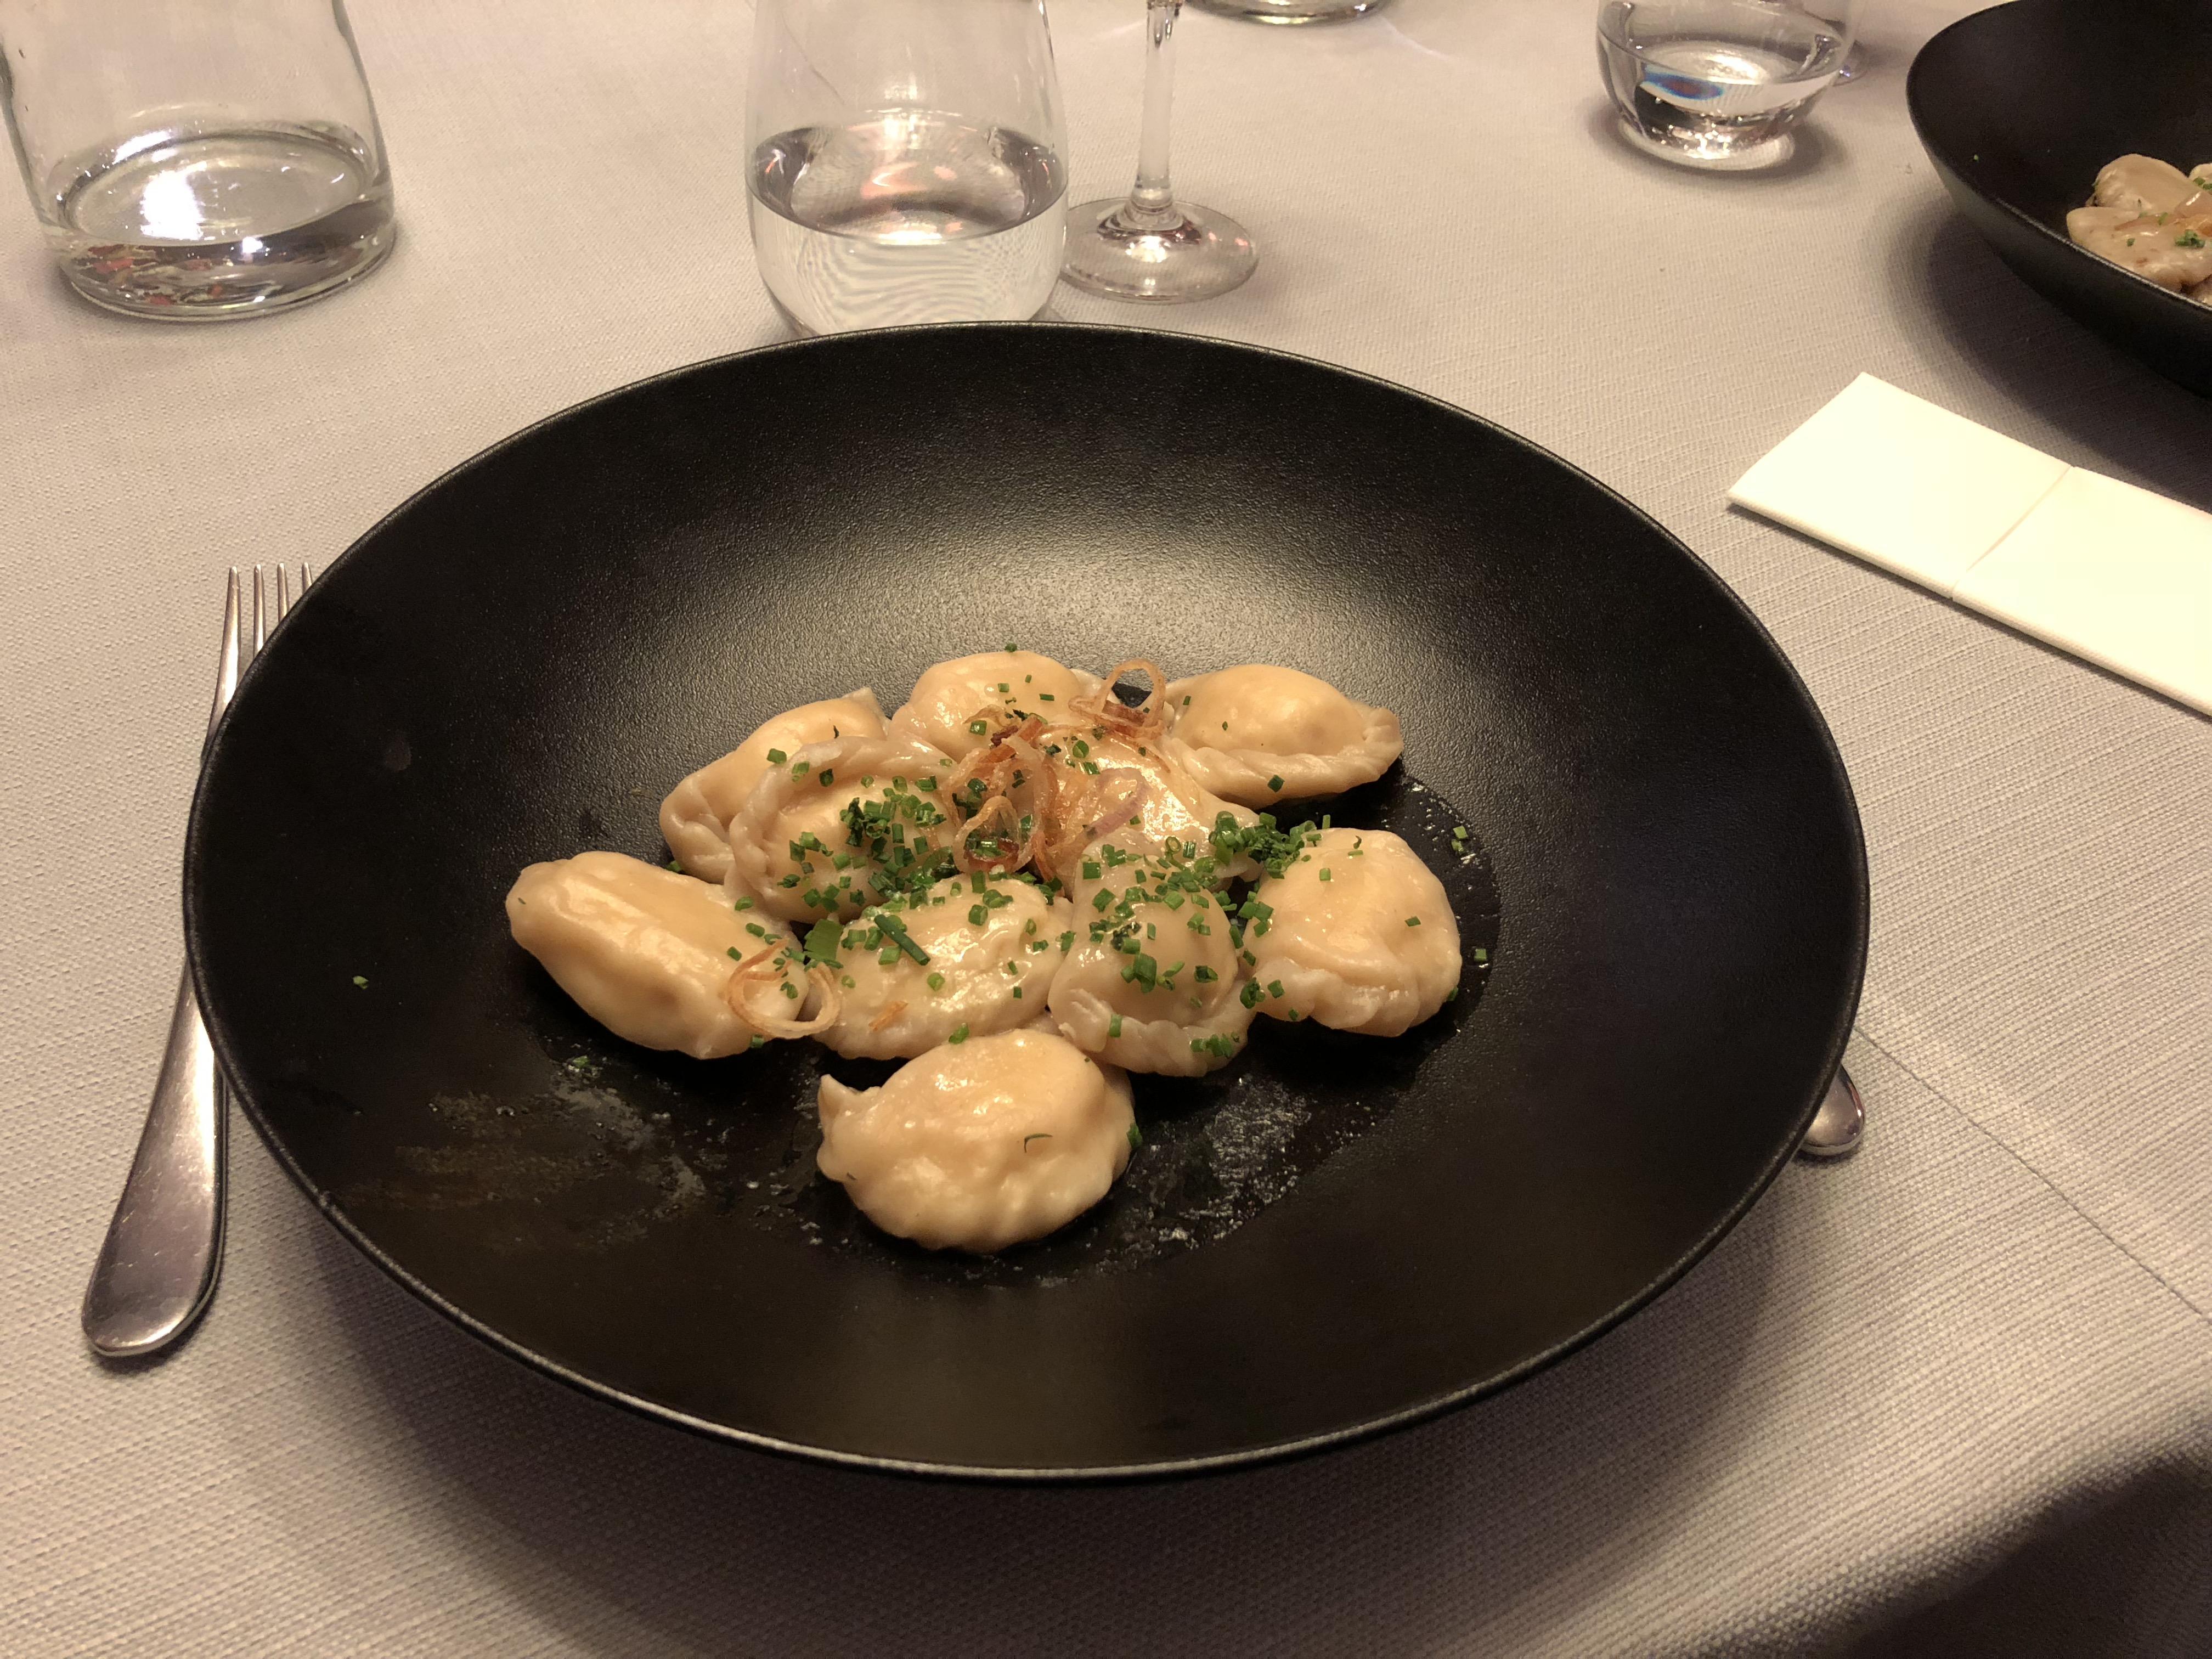 blog-mode-beaute-lifestyle-deco-voyage-cuisine-cityguide-strasbourg